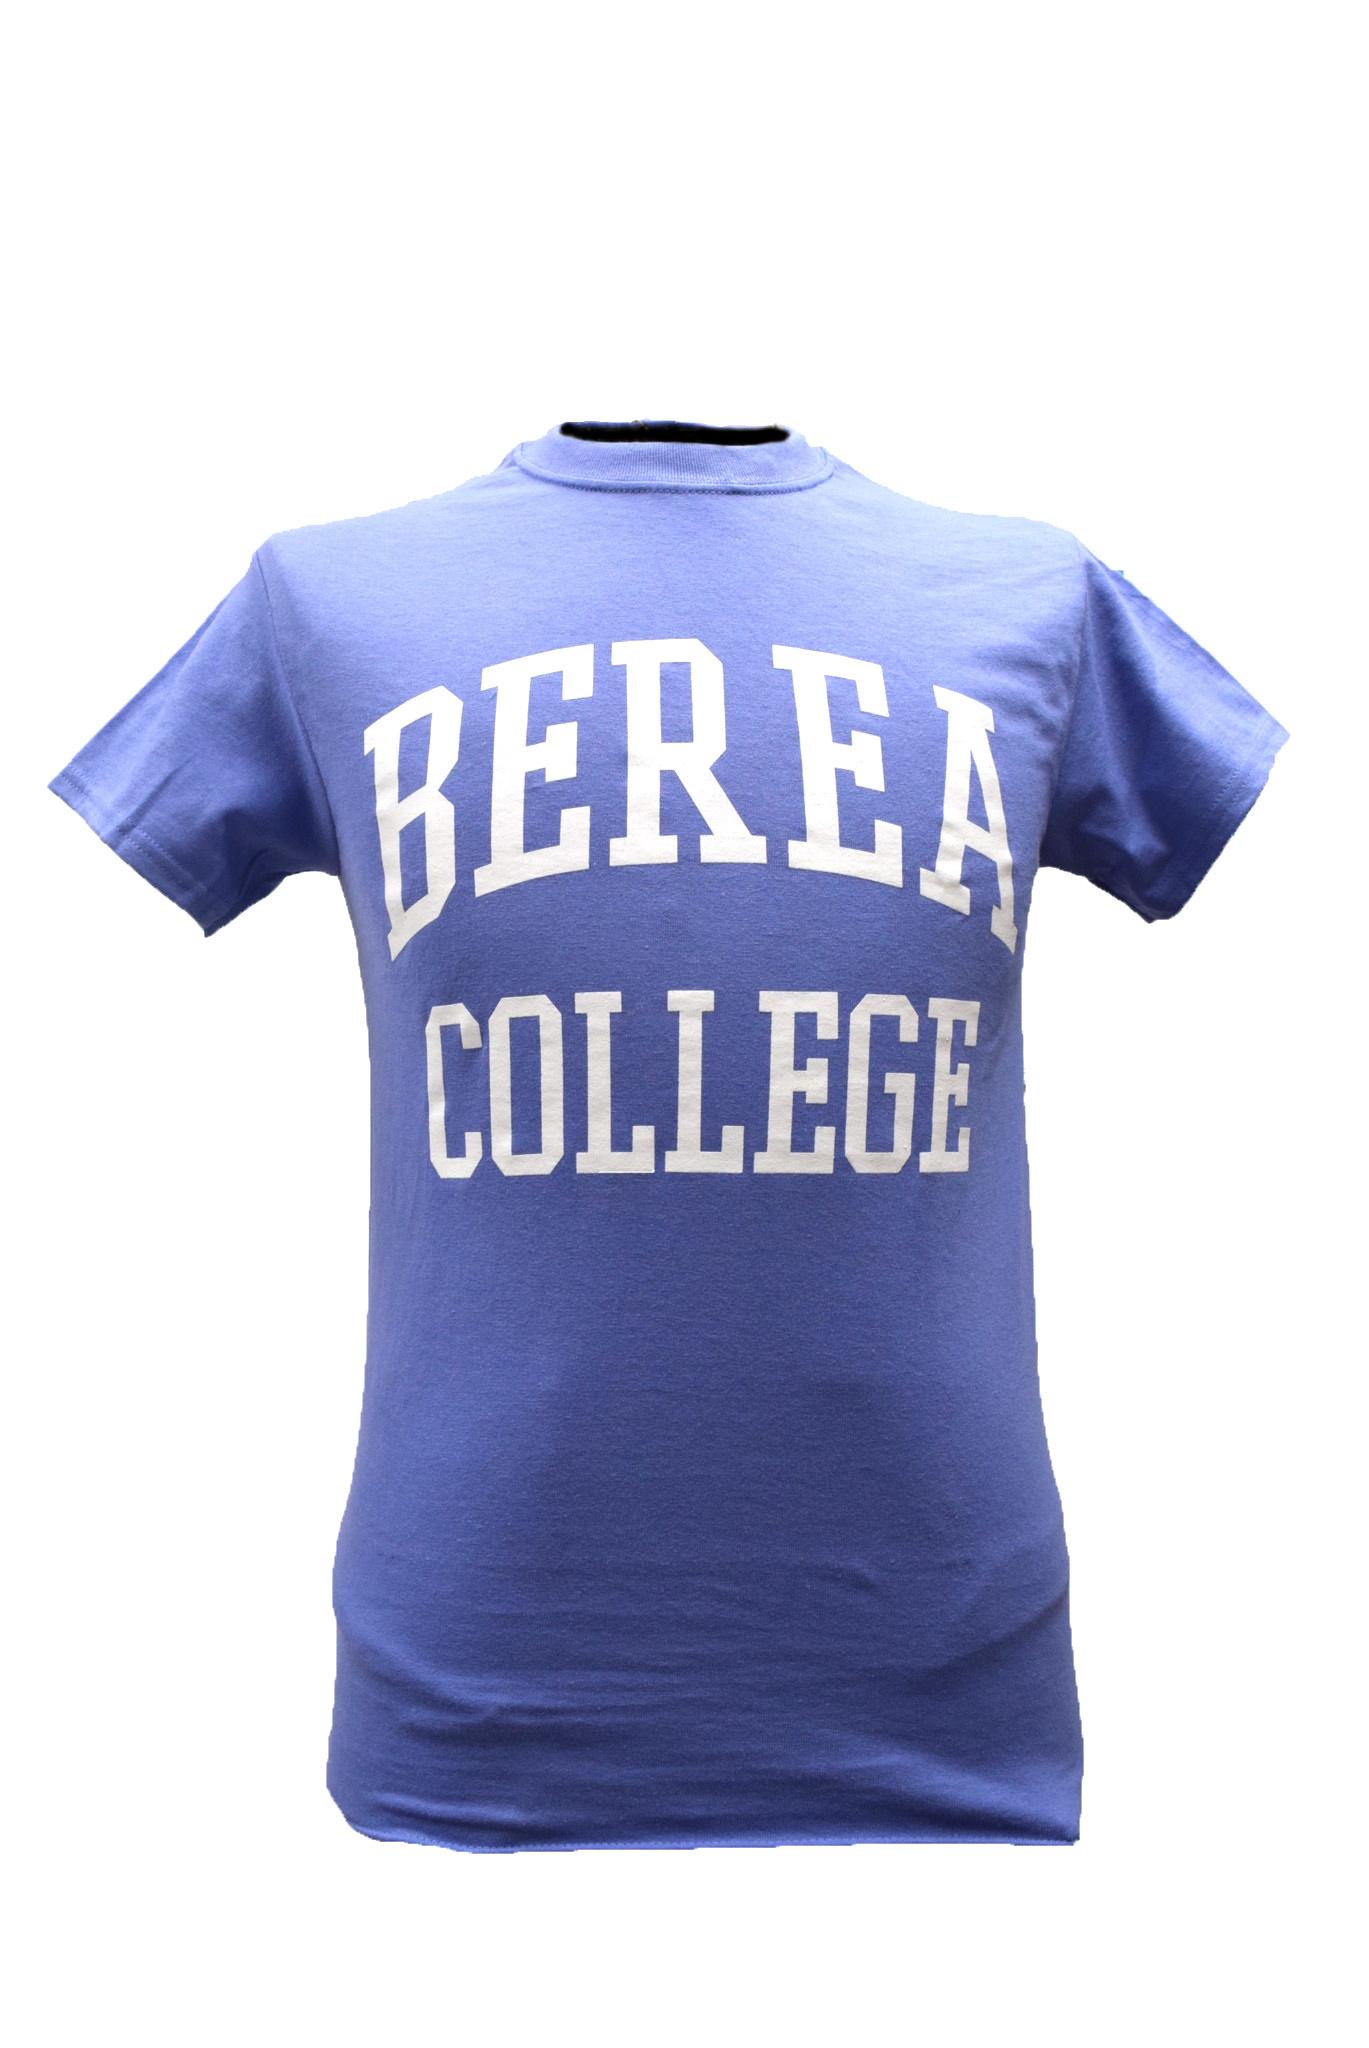 Berea College Classic T- Shirt-6